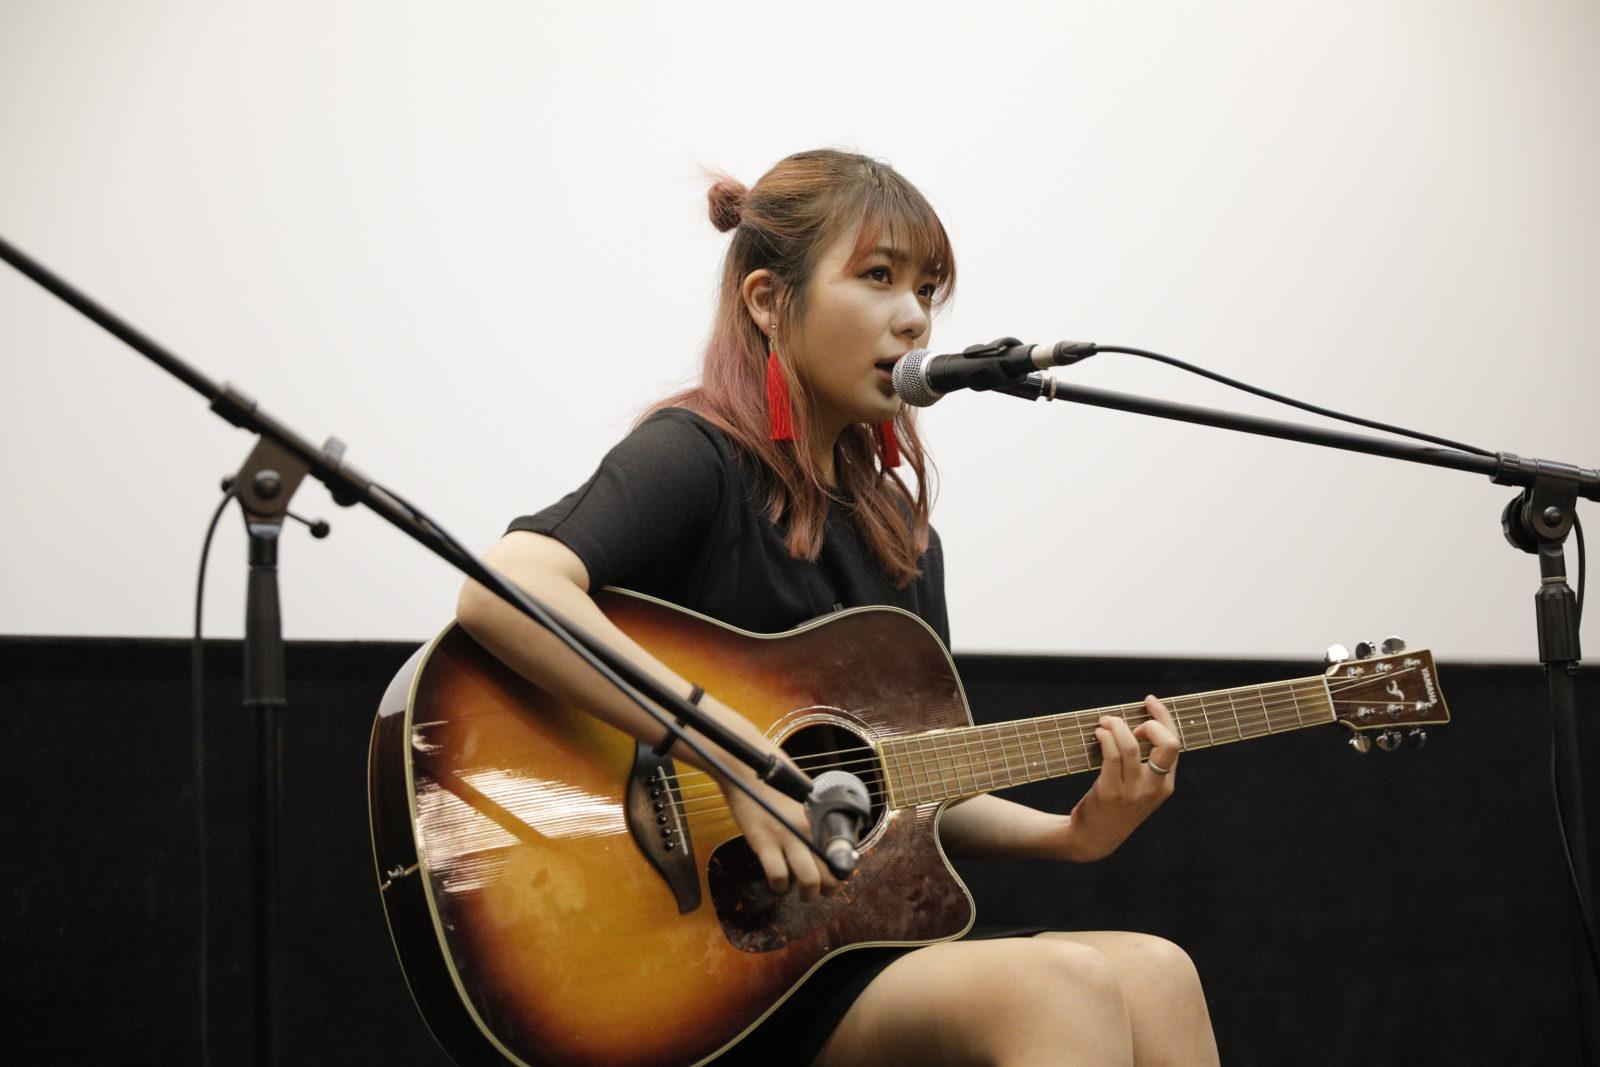 the peggies・北澤ゆうほ、出演する映画「脱脱脱脱17」舞台挨拶で弾き語り披露サムネイル画像